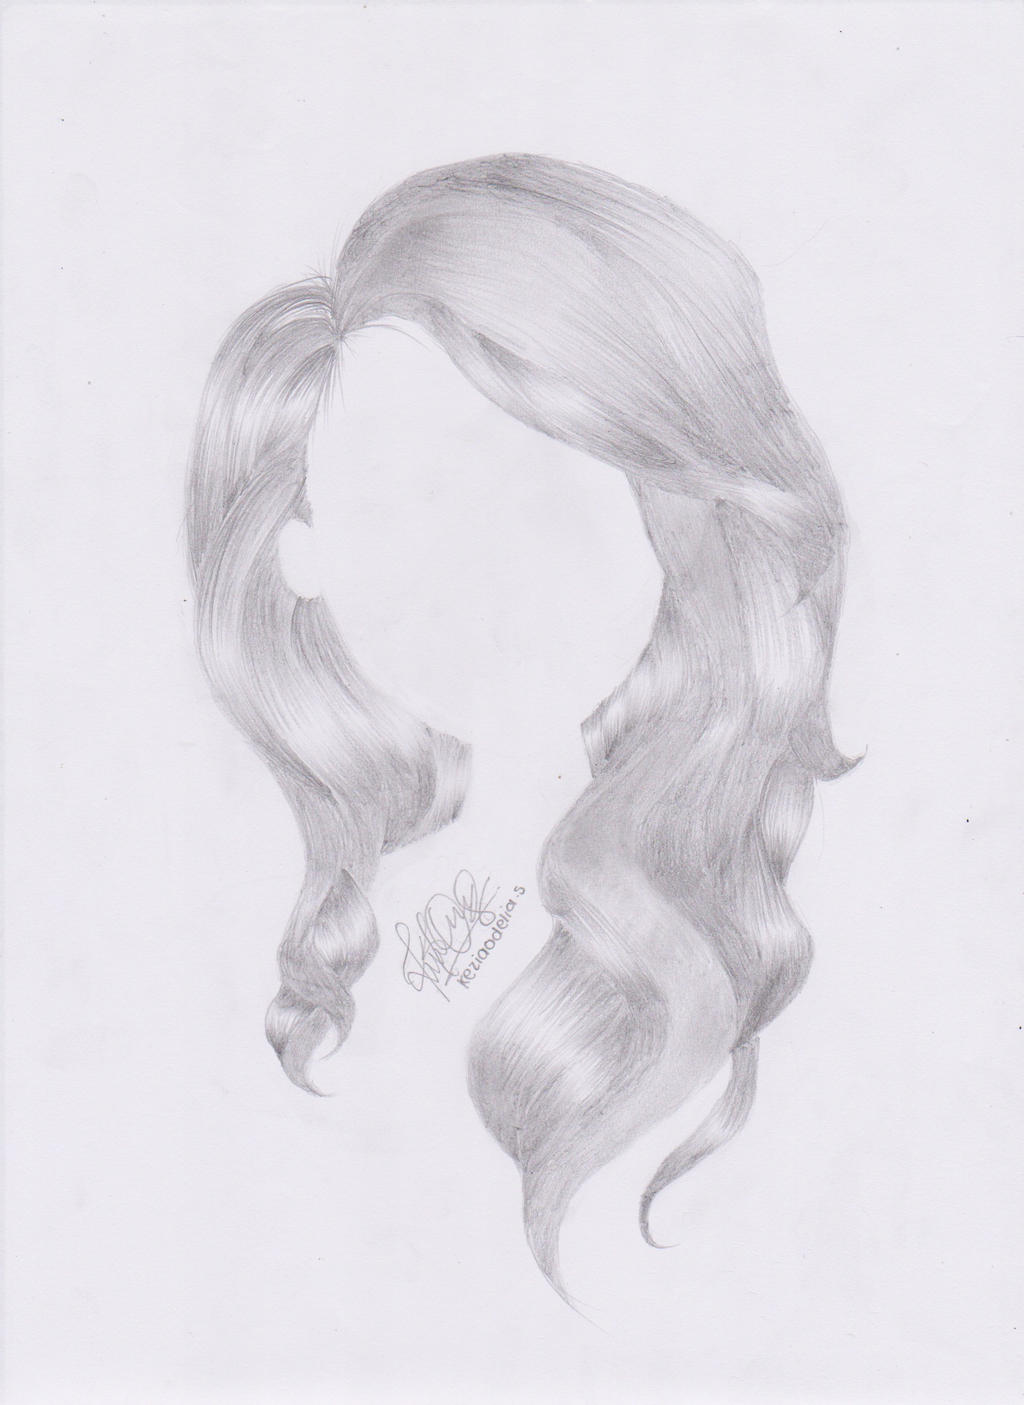 Wavy Hair Drawing By Keziaodelia On Deviantart